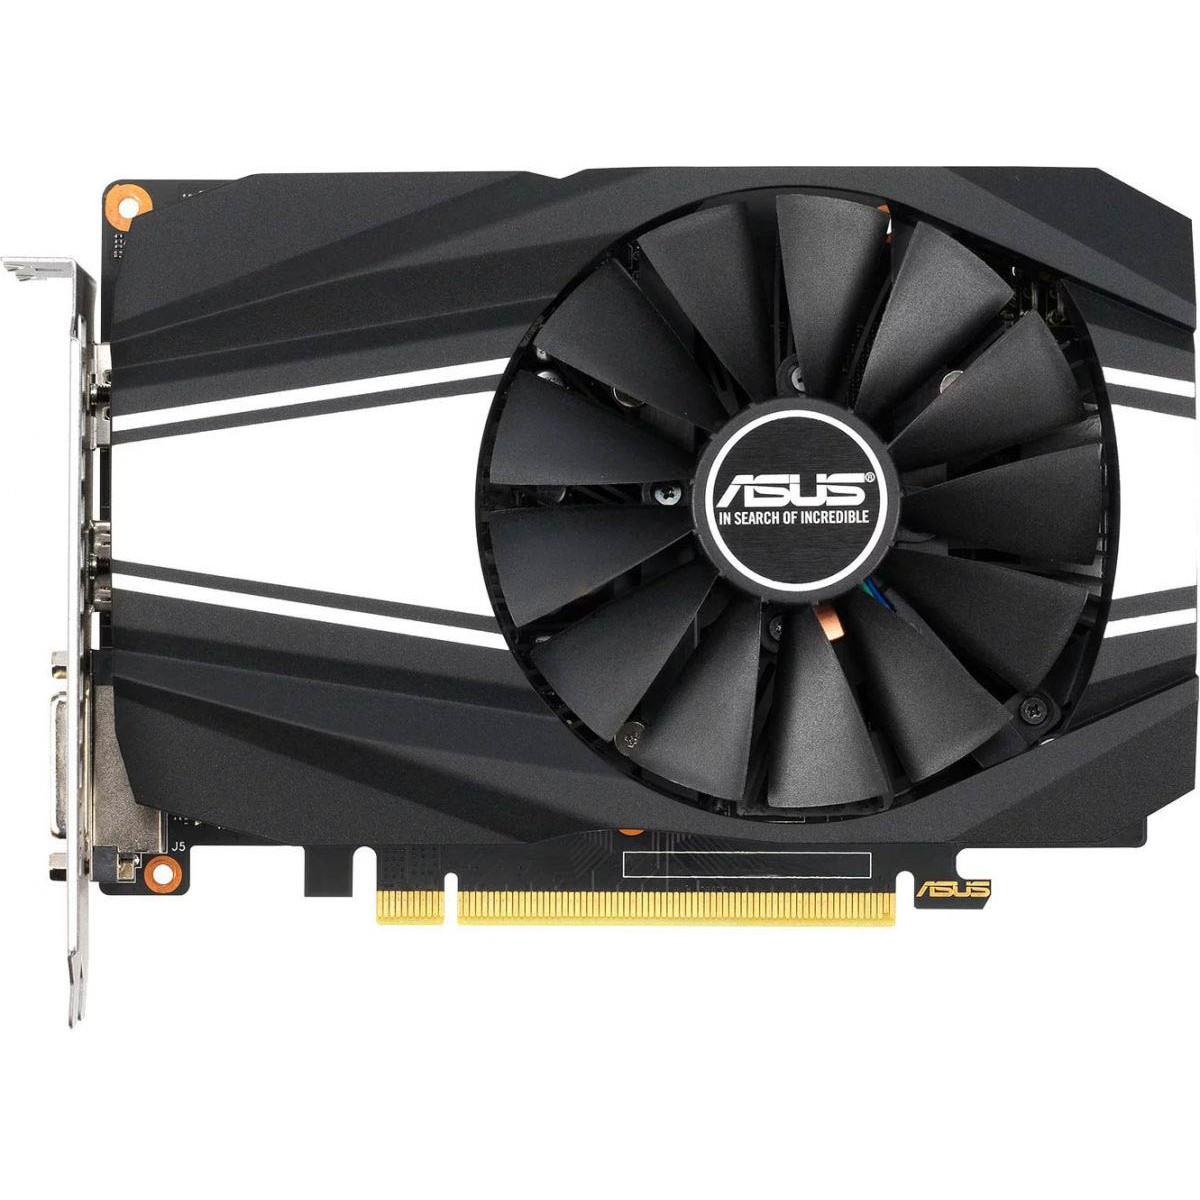 Placa de Vídeo 6GB PCI-E Nvidia Geforce GTX 1660 SUPER  - 192-Bit - PC FLORIPA